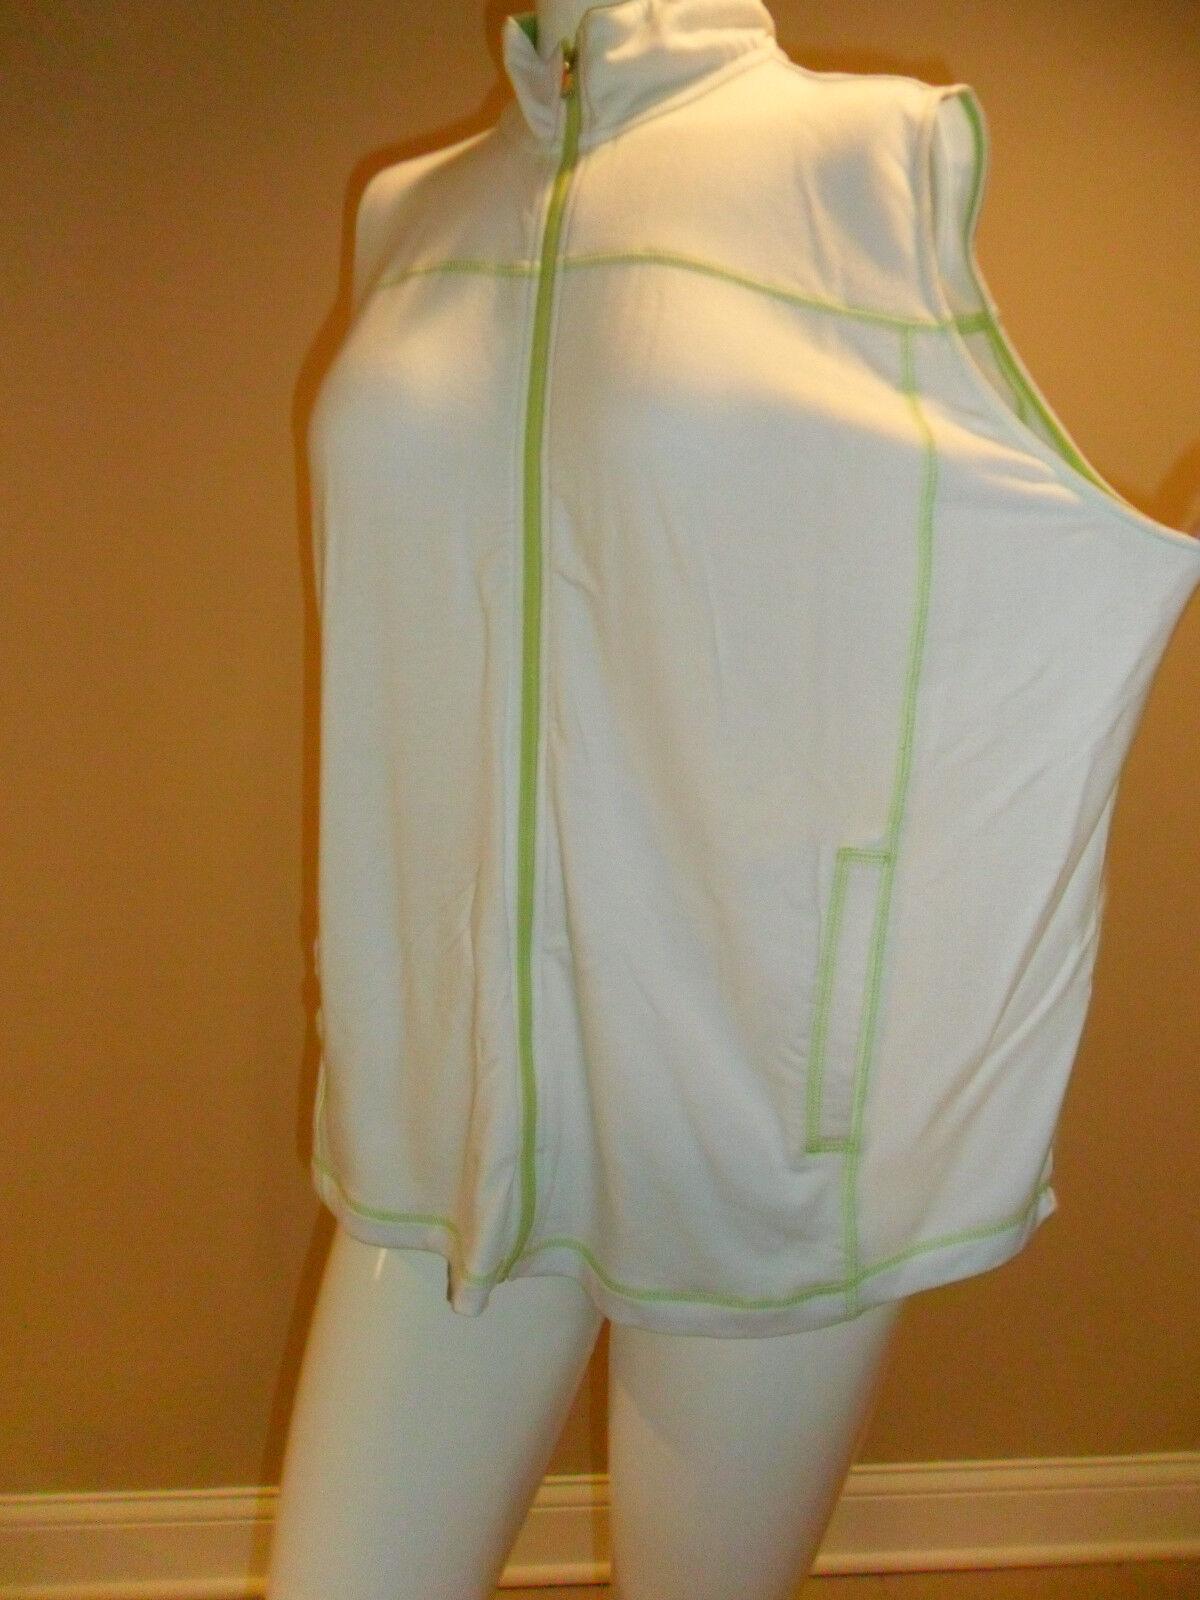 Chaps women's plus Solid Solid Solid  Zip up Vest White Contrasting neon trim Size 2X New wt 9d87a0